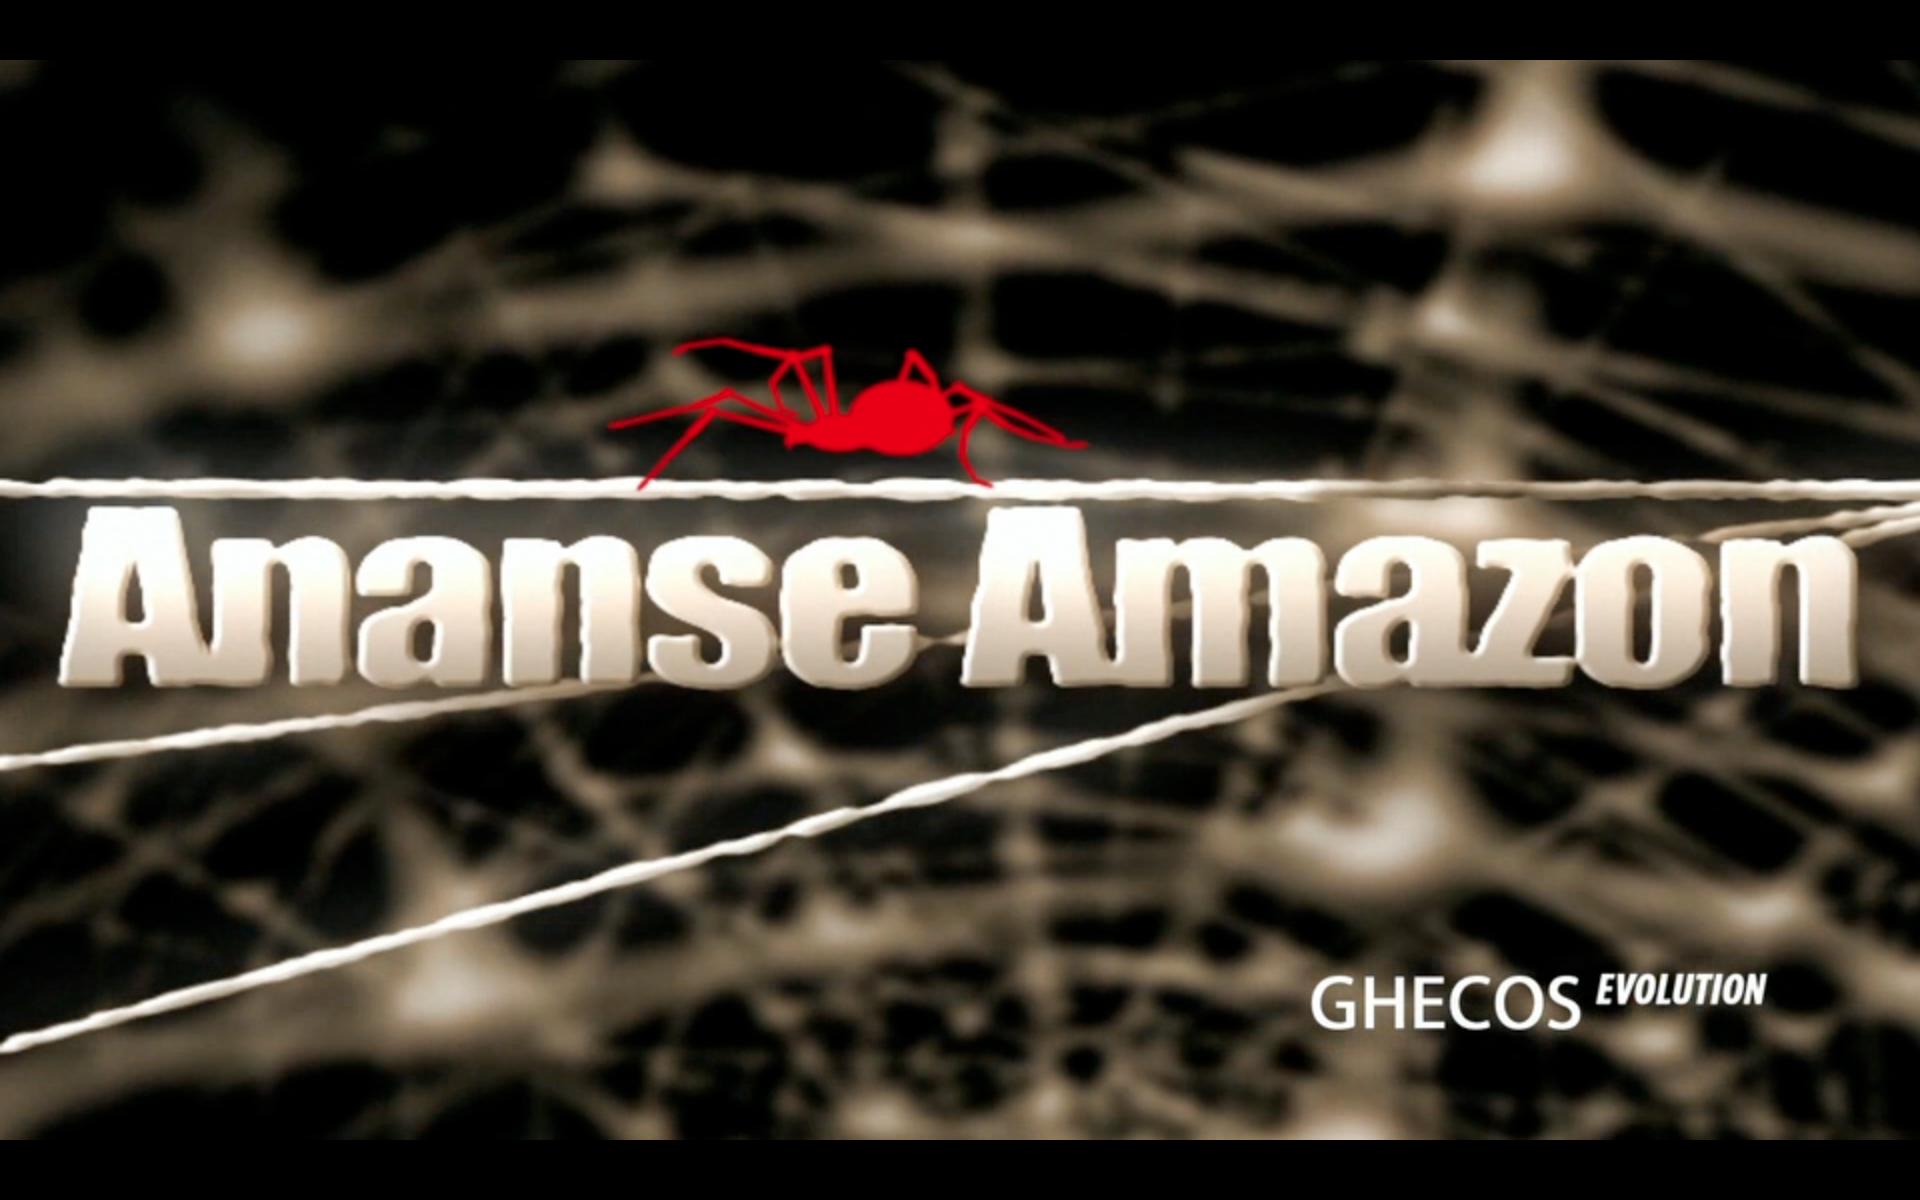 Ghana Comic Network